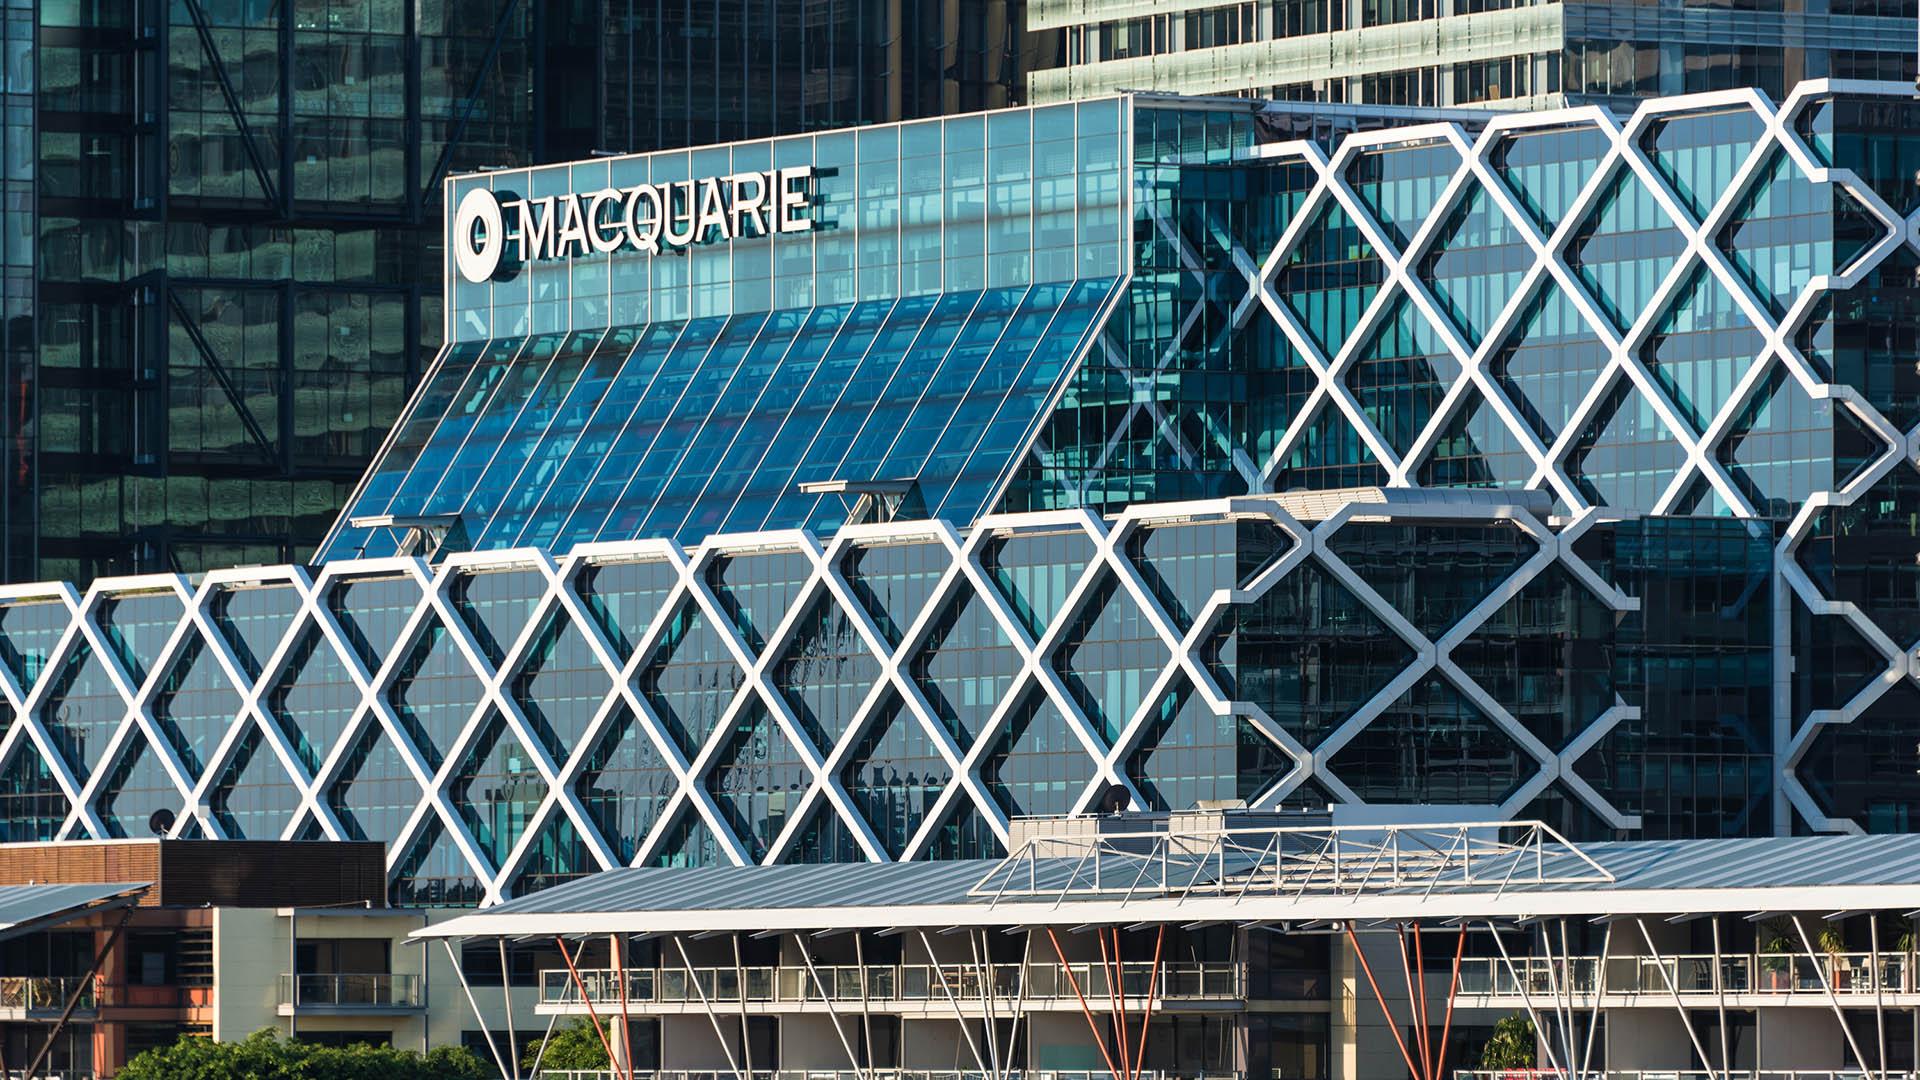 Macquarie Group (ASX:MQG) net profit up 11% compared to 1H19